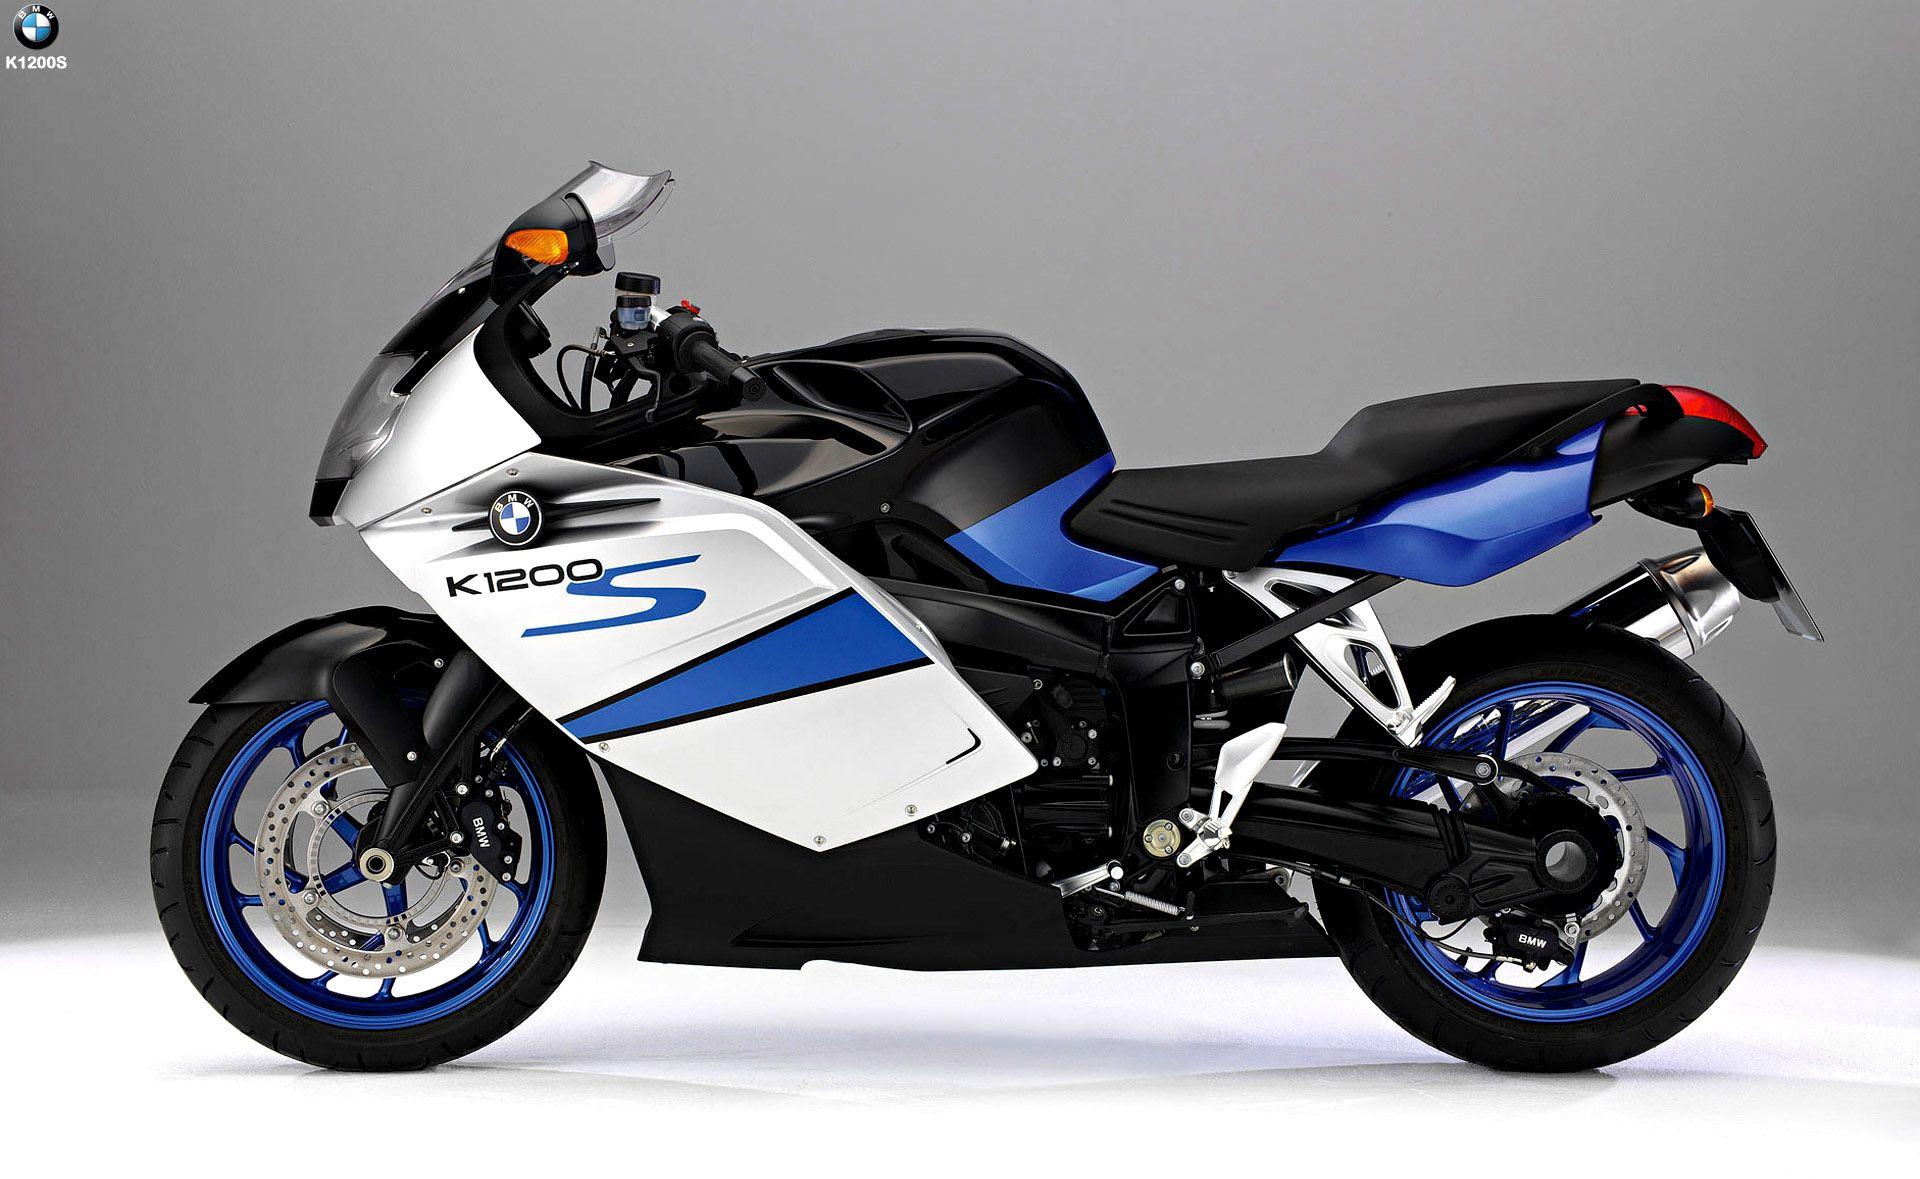 Beautiful Hd Pics Wallpaper Bmw K1200s Wallpaper Bmw Sport Sport Bikes Bmw Motorcycles